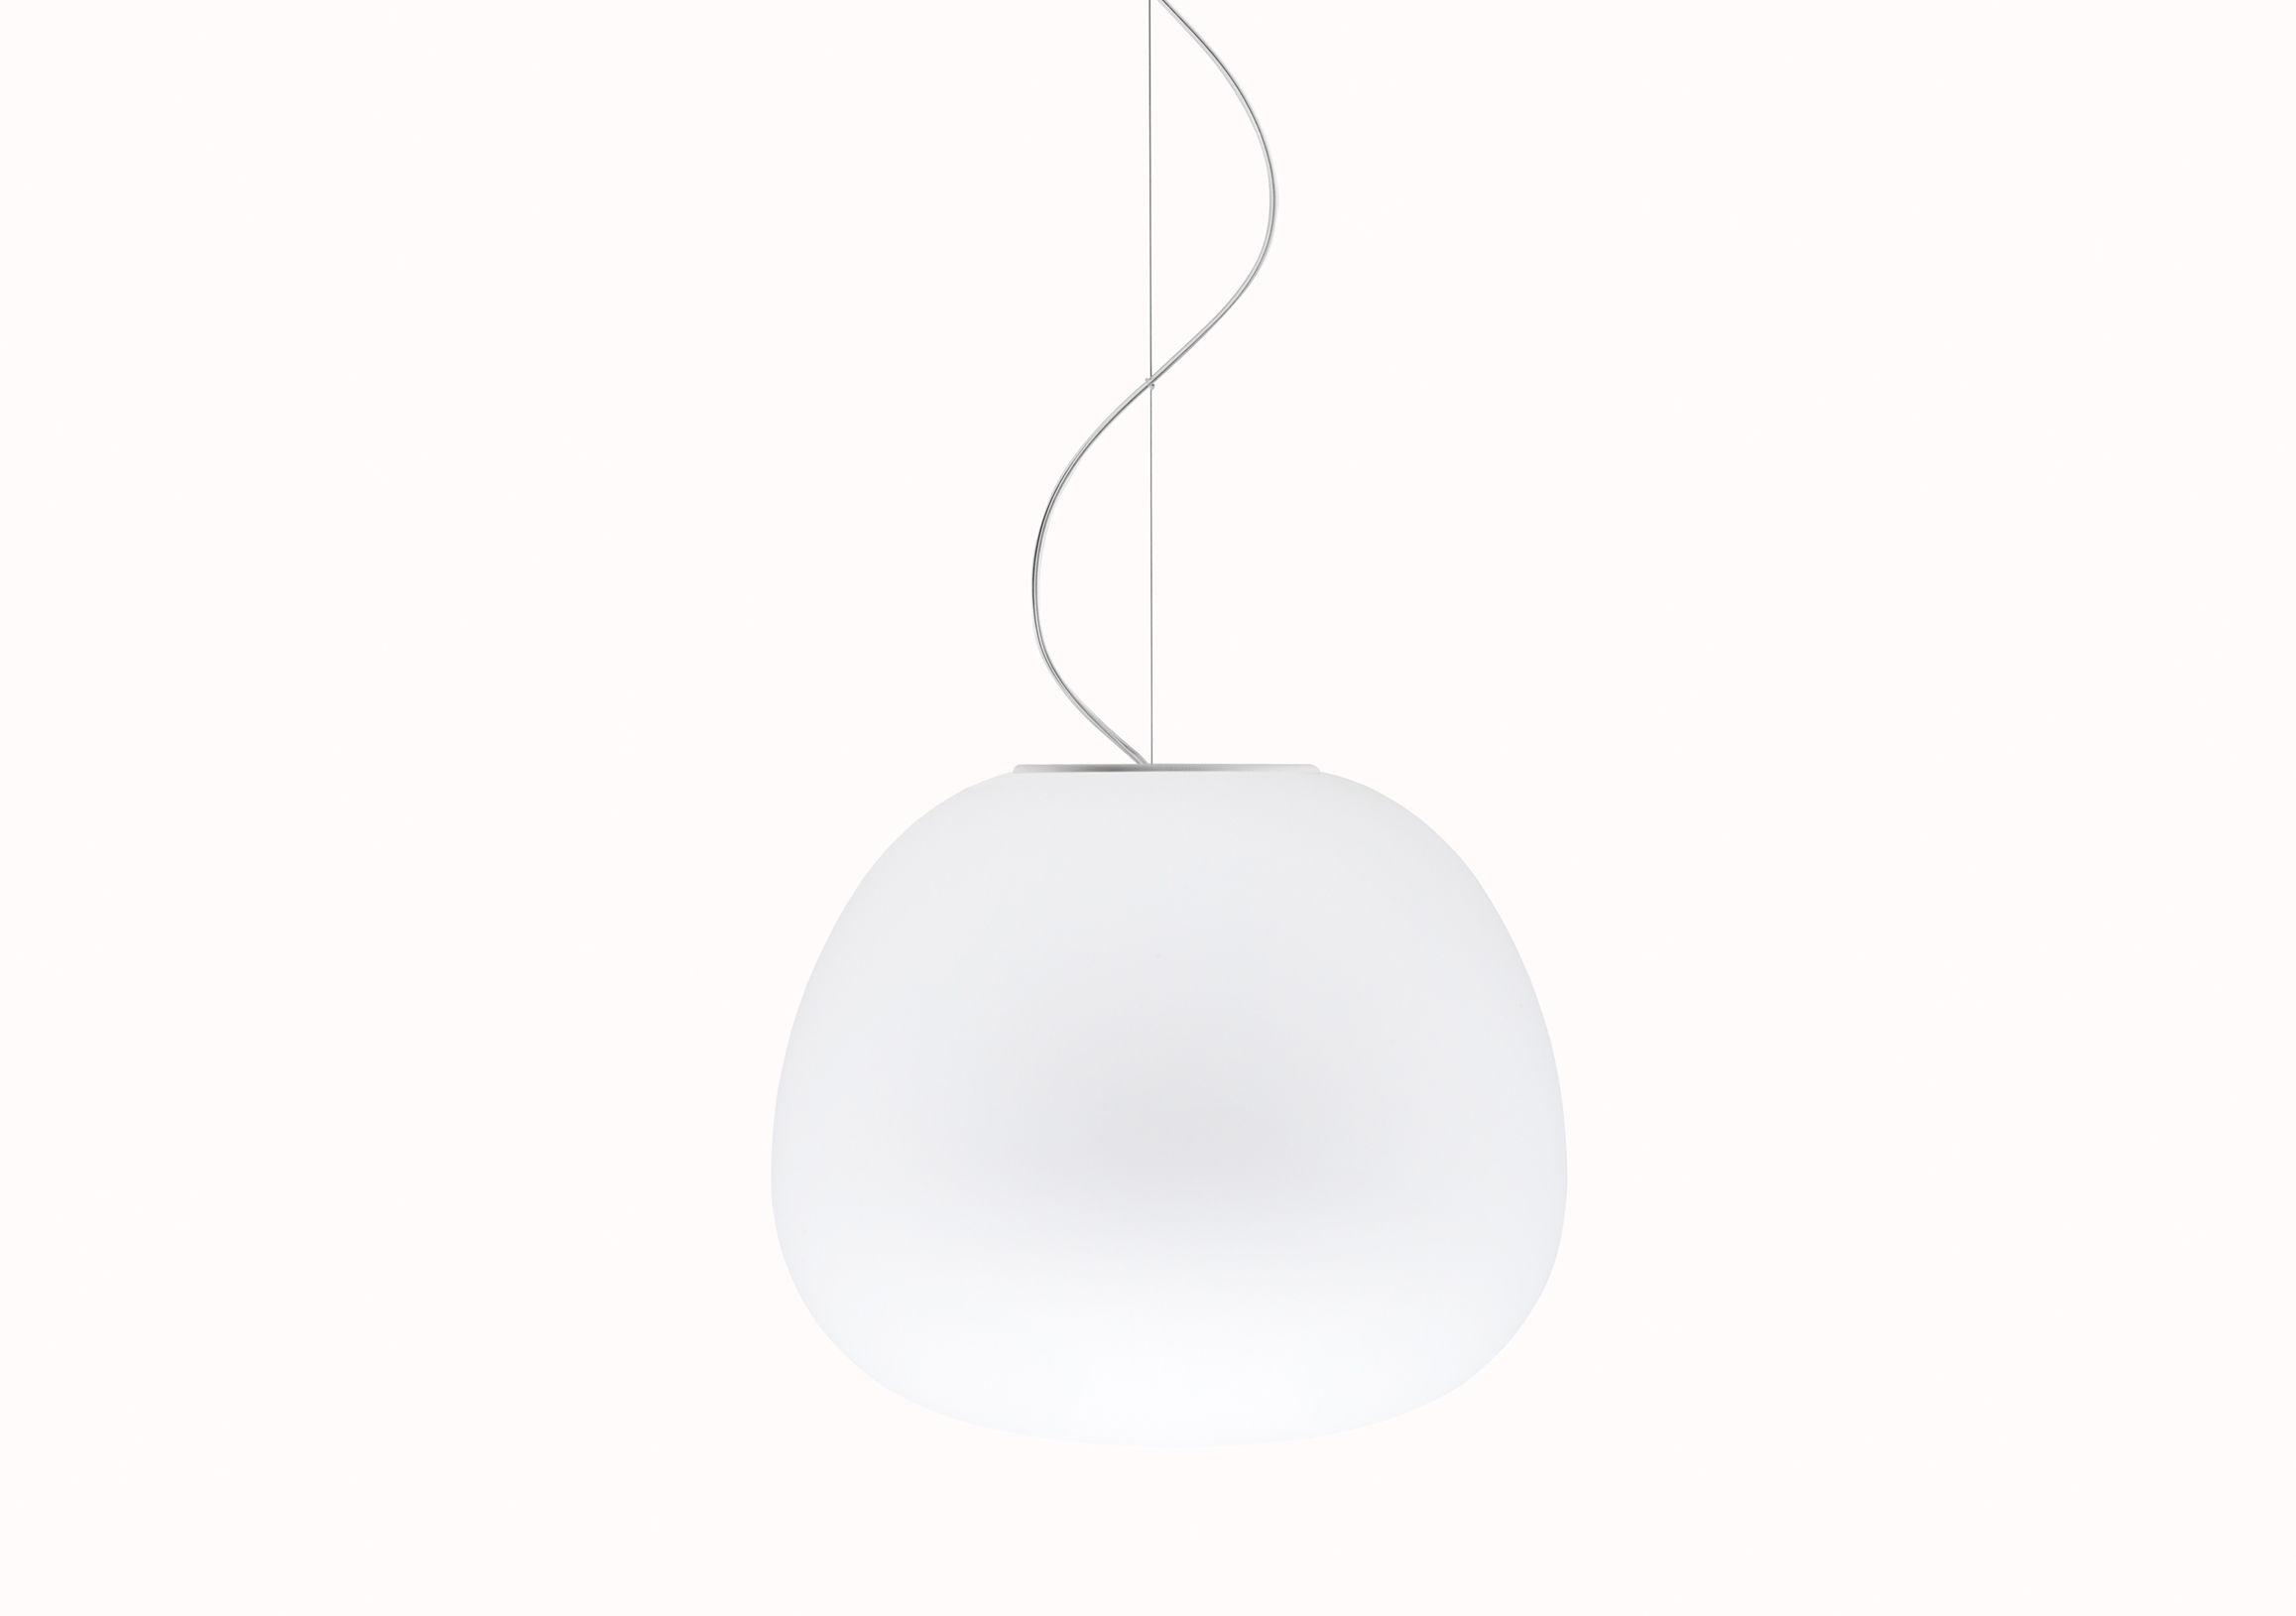 Lighting - Pendant Lighting - Mochi Pendant - Ø 45 cm by Fabbian - White - Ø 45 cm - Glass